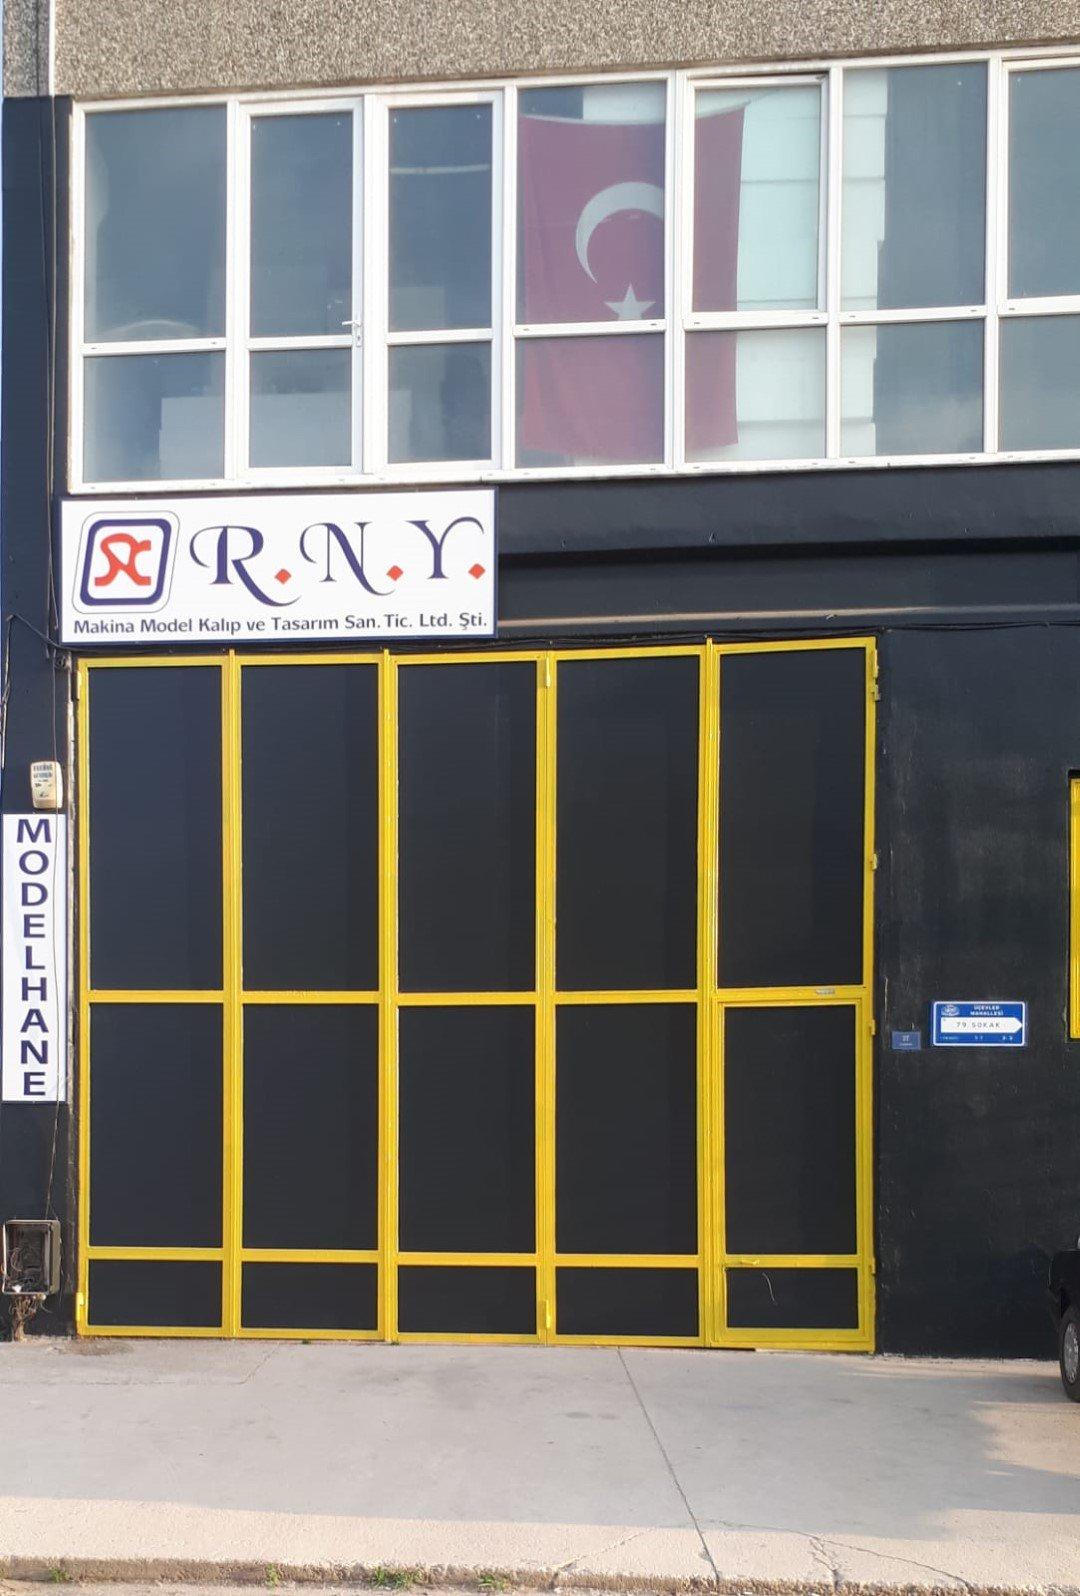 RNY Makina Model Kalıp Tasarım San.Tic.Ltd.Şti.